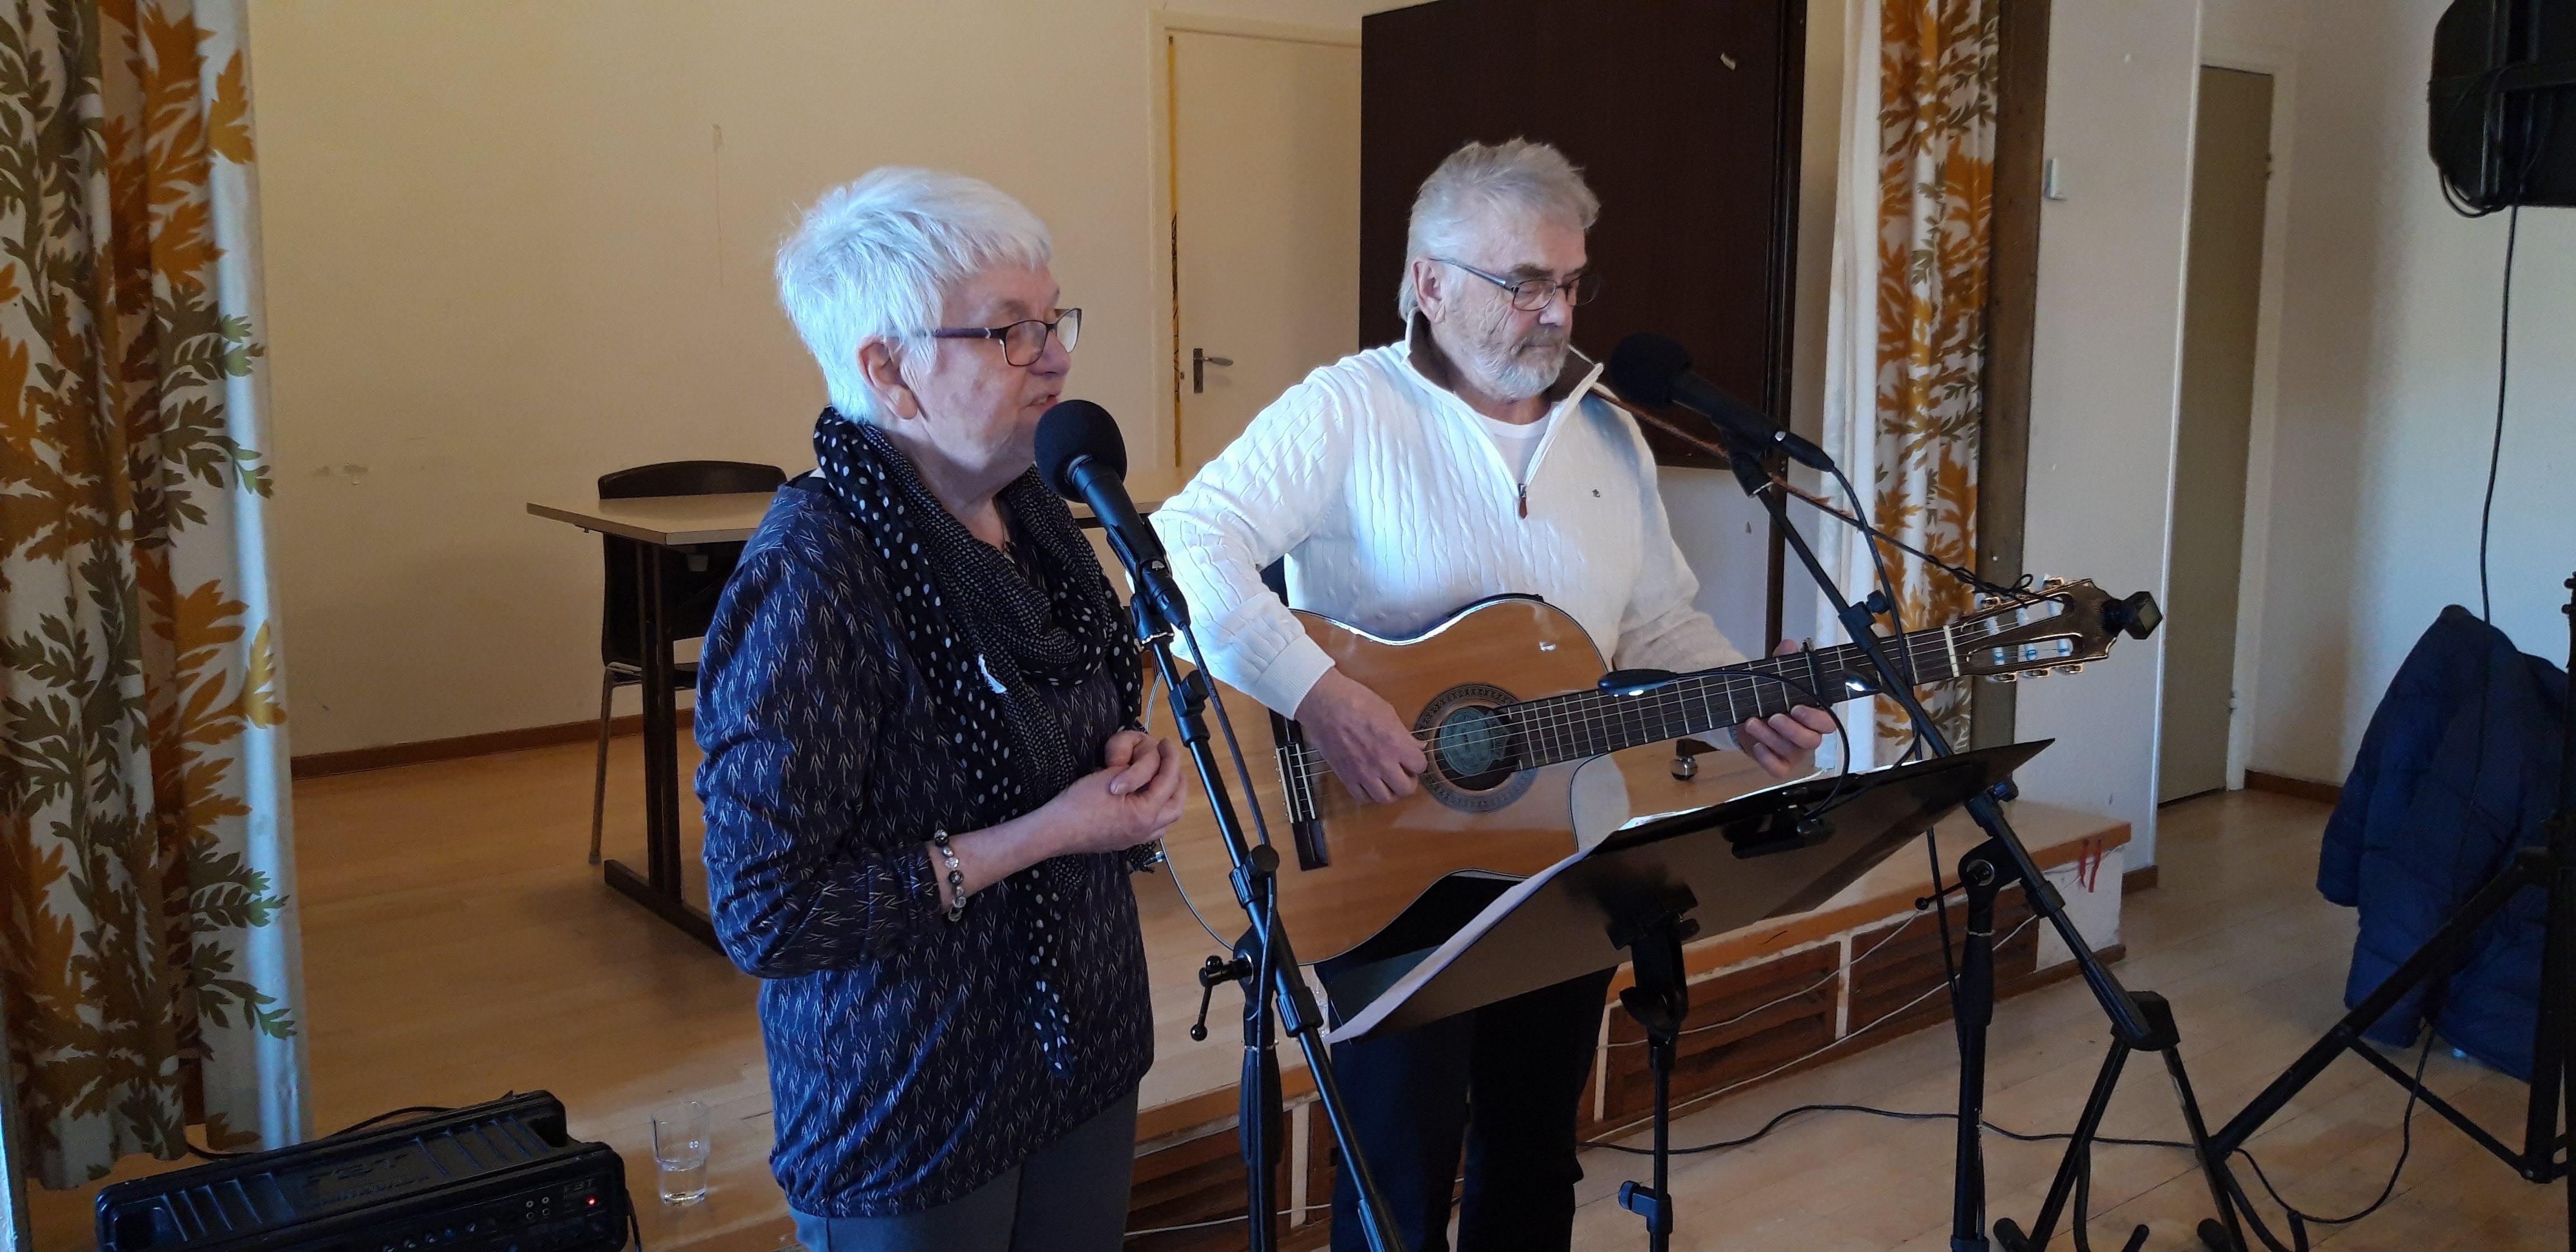 Underhållarna Ann-Christine och Leif Thuresson